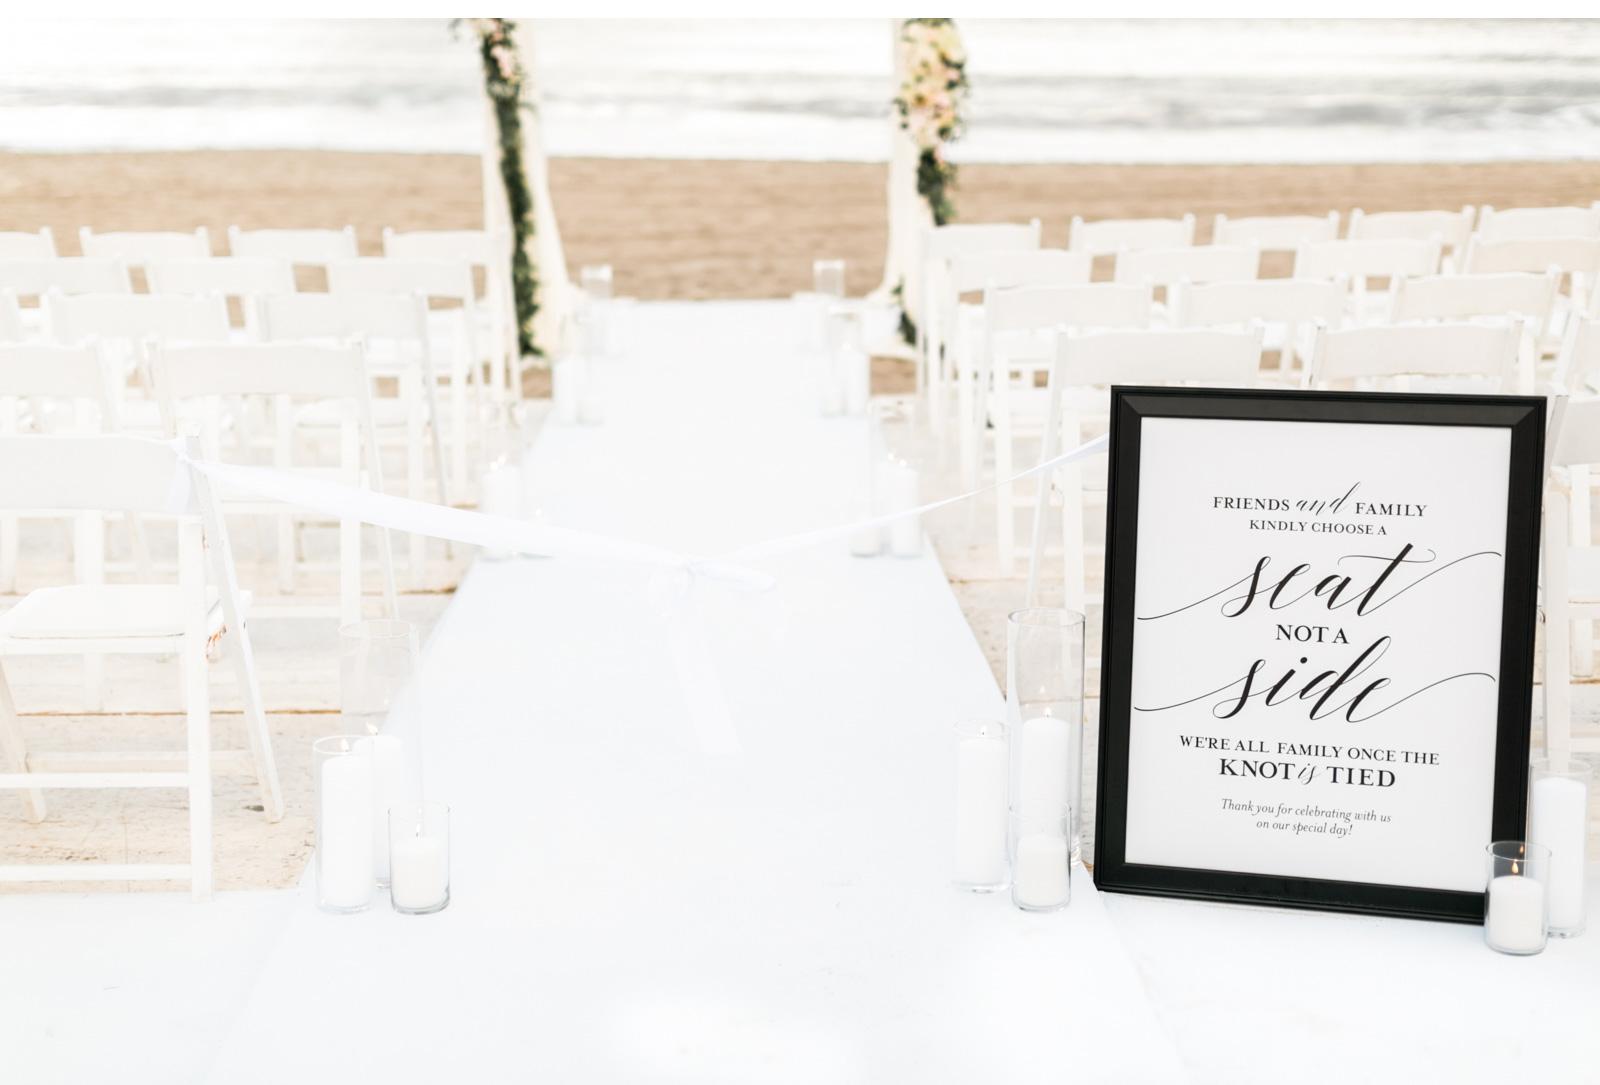 Sunset-Restaurant-Malibu-Beach-Wedding-Natalie-Schutt-Photography_12.jpg